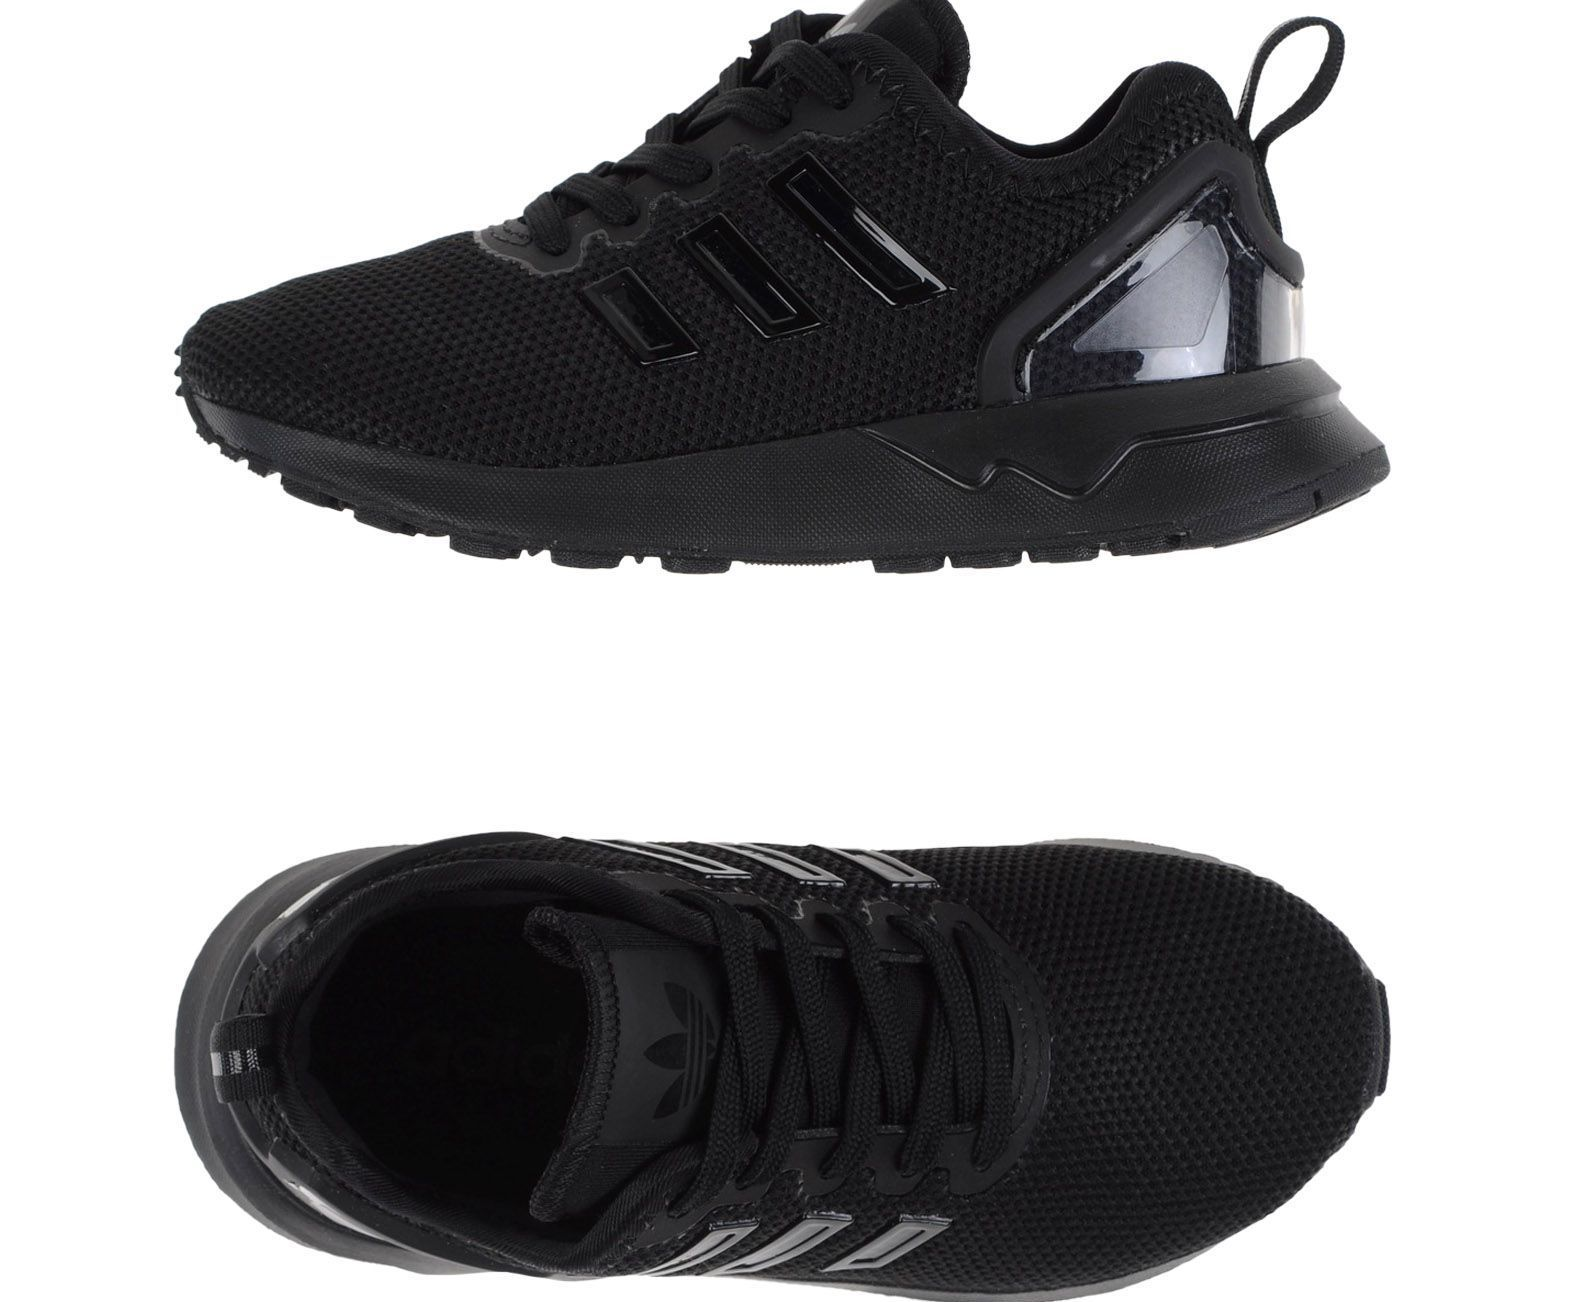 wholesale dealer 5403e 3da40 ADIDAS ORIGINALS ΠΑΠΟΥΤΣΙΑ Παπούτσια τένις χαμηλά  sales  style  fashion